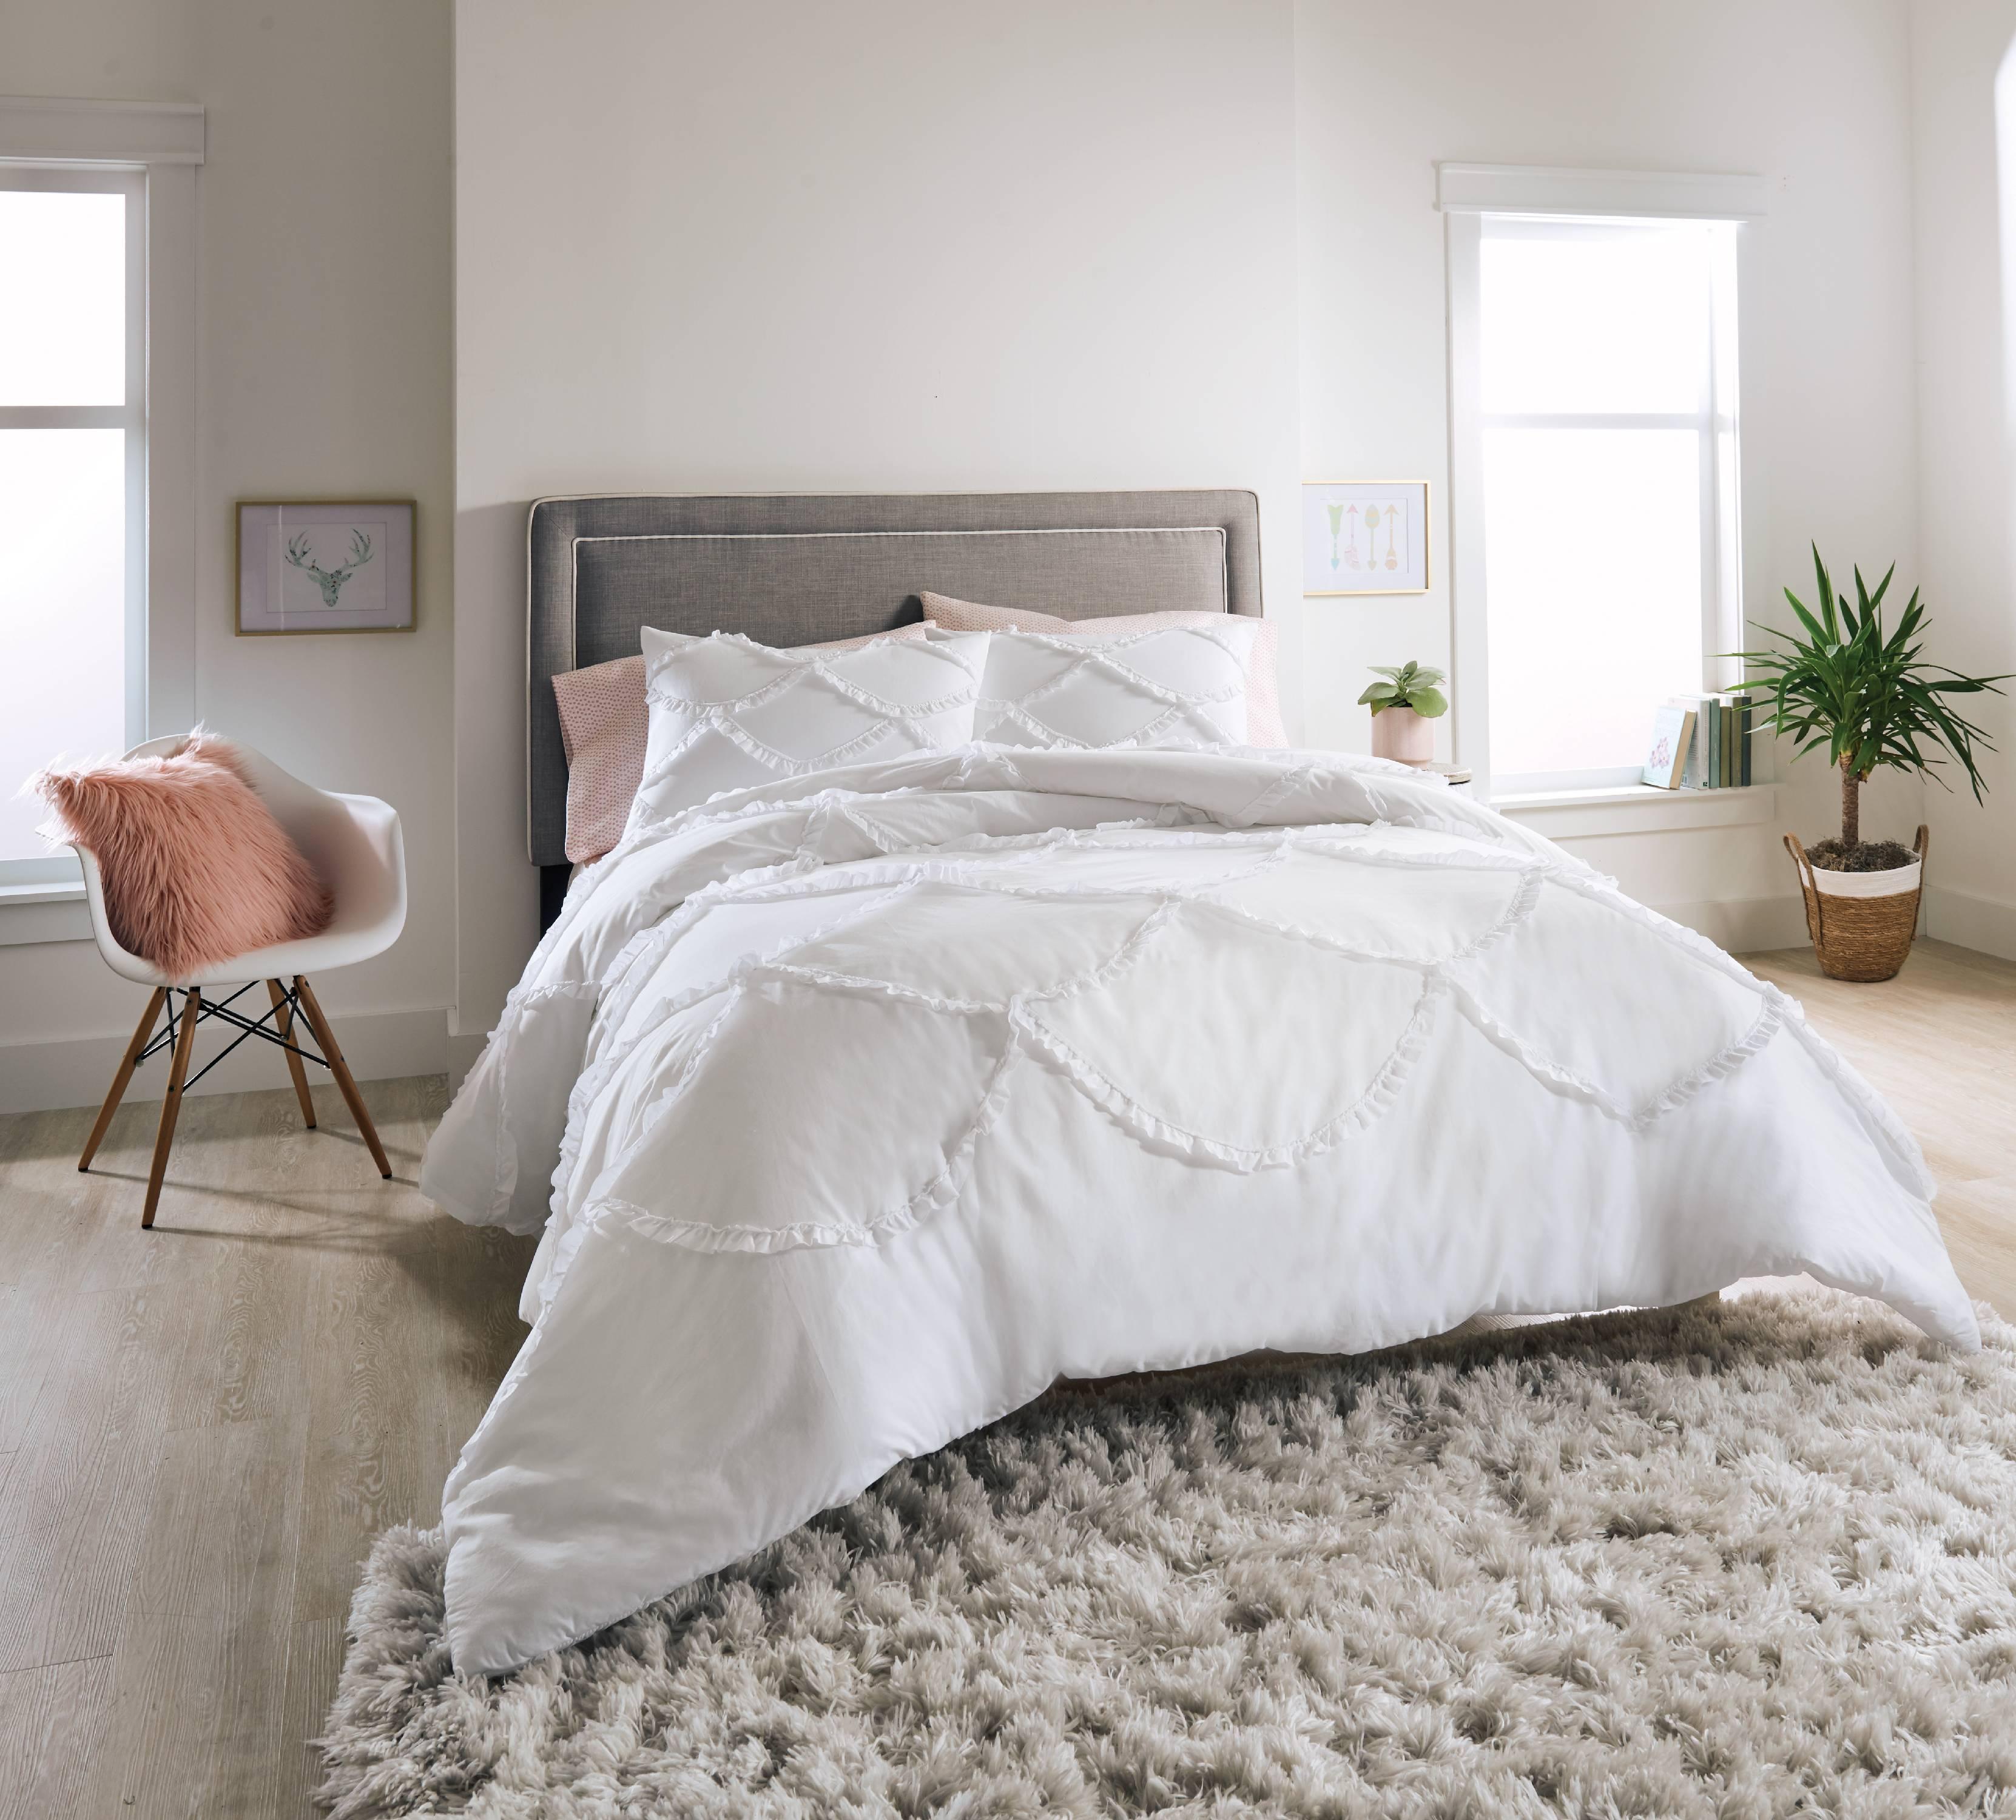 Better Homes and Gardens 3-Piece Textured Scallop Comforter Set